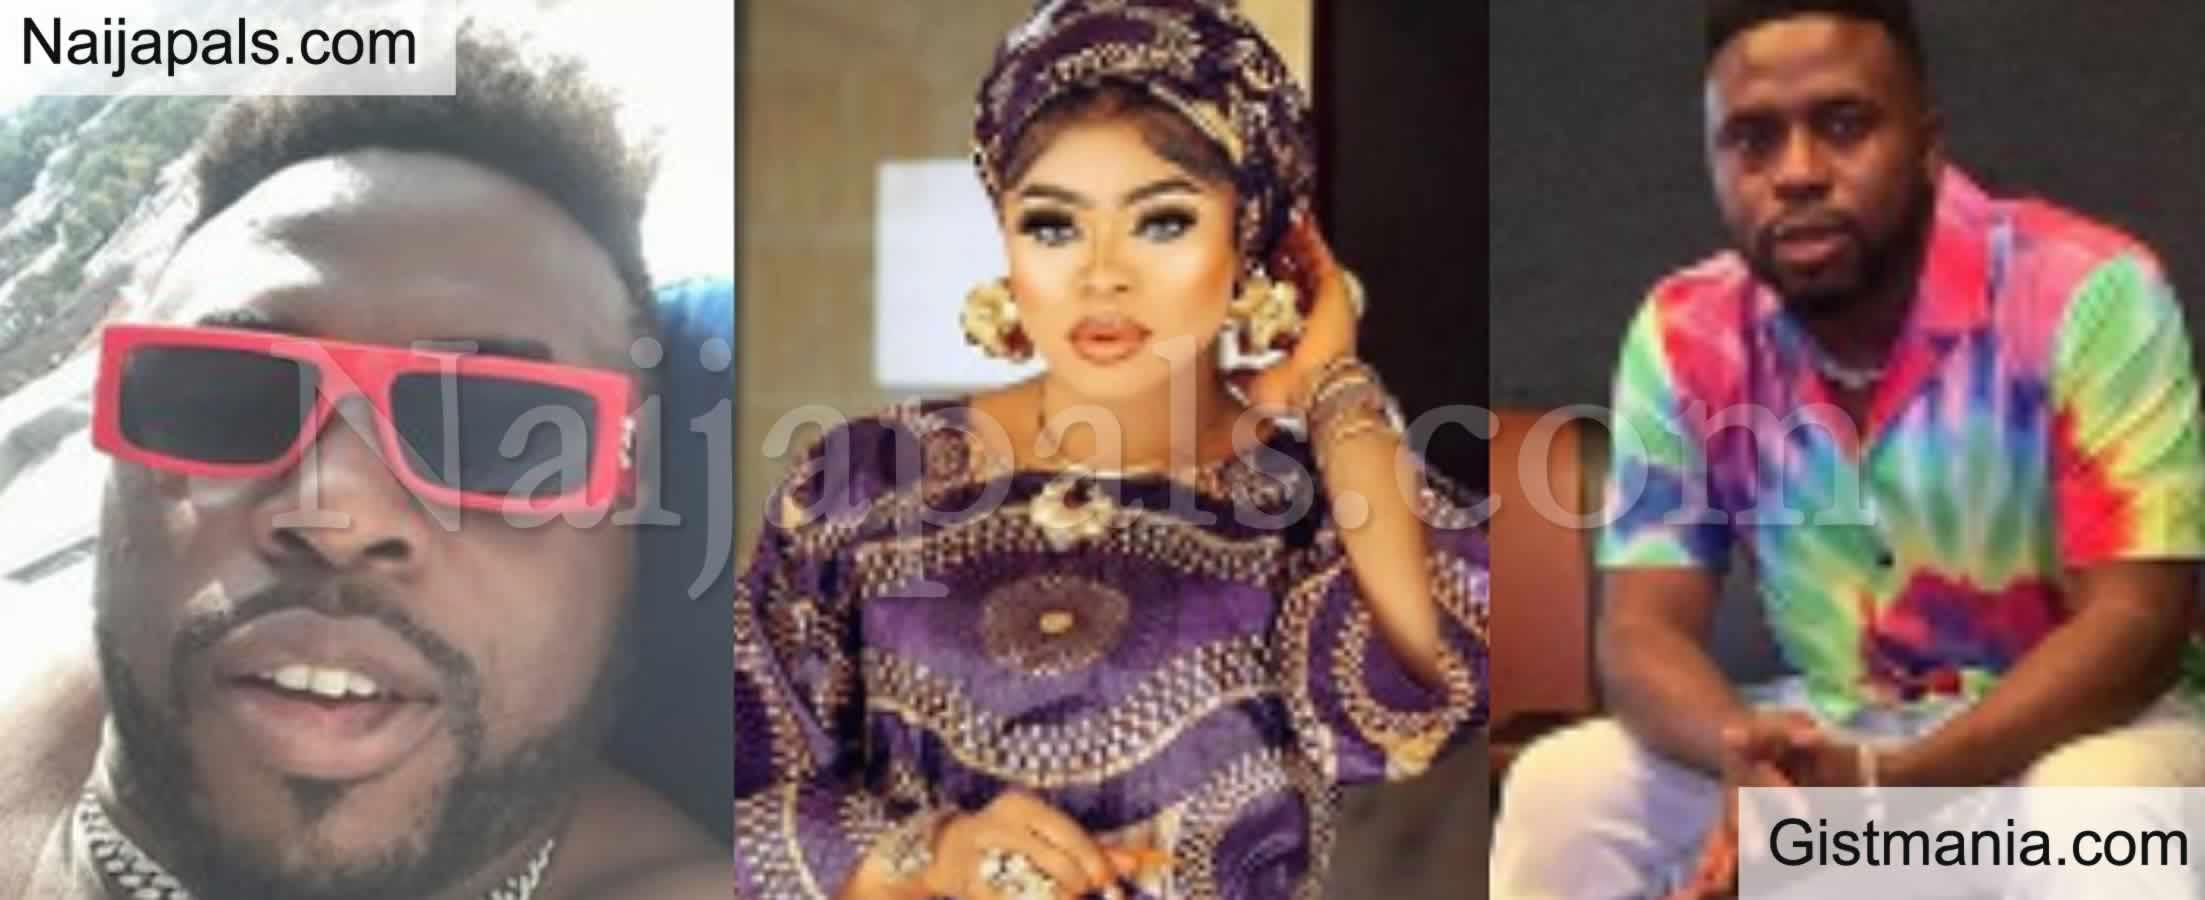 <img alt='.' class='lazyload' data-src='https://img.gistmania.com/emot/photo.png' /> PHOTOS: <b>Nigerians Drag Ex Singer Samklef Over His Conversation With Bobrisky</b>